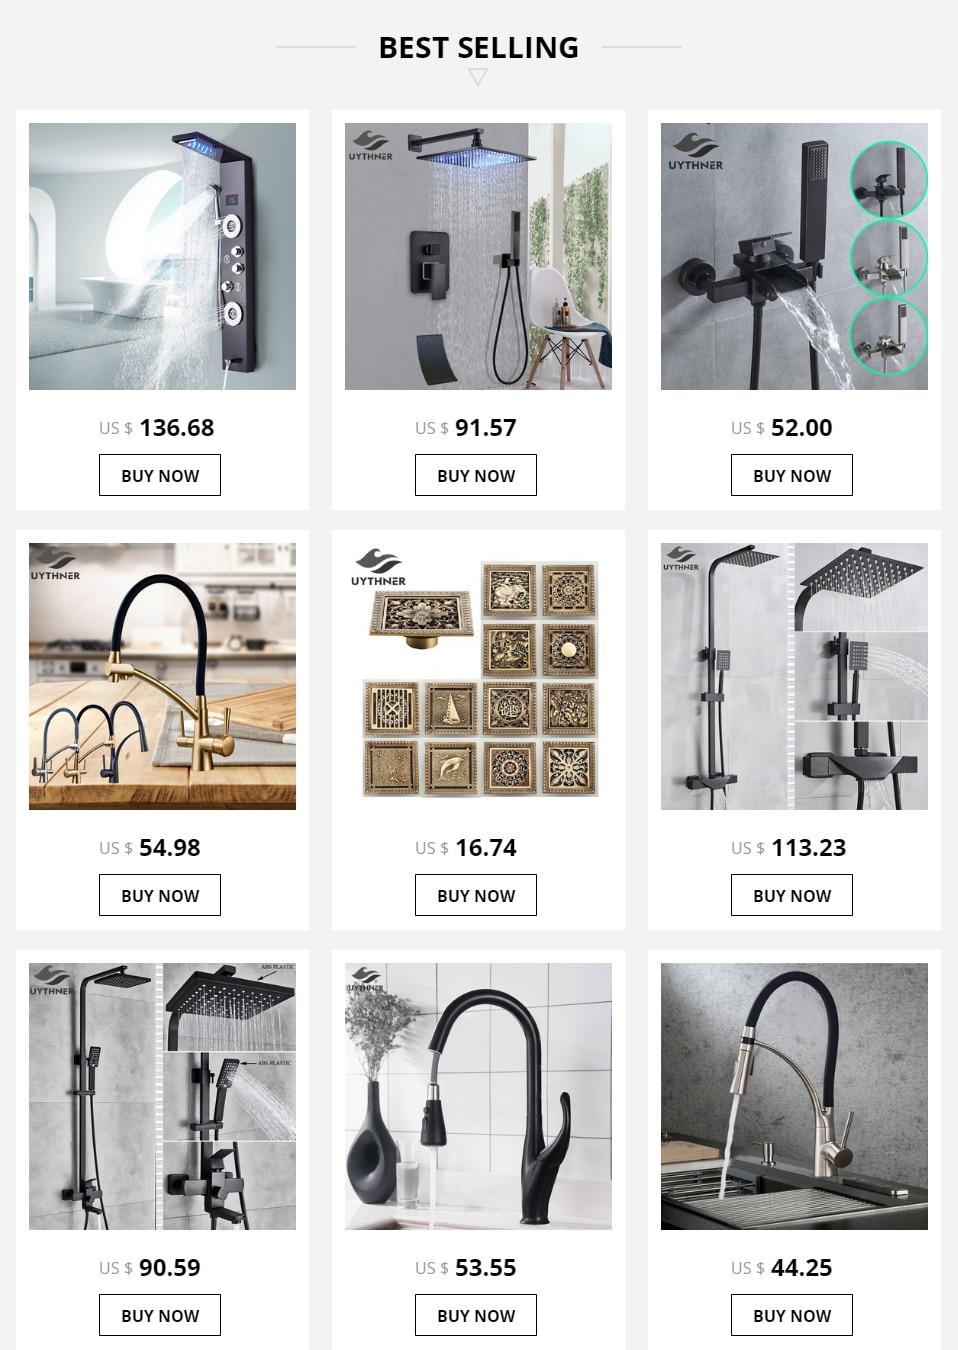 "He3f082755dcd4299af5ffd9c1e47ba43Q Gold Polish Bathroom Rain Shower Faucet Bath Shower Mixer Tap 8"" Rainfall Head Shower Set System Bathtub Faucet Wall Mounted"